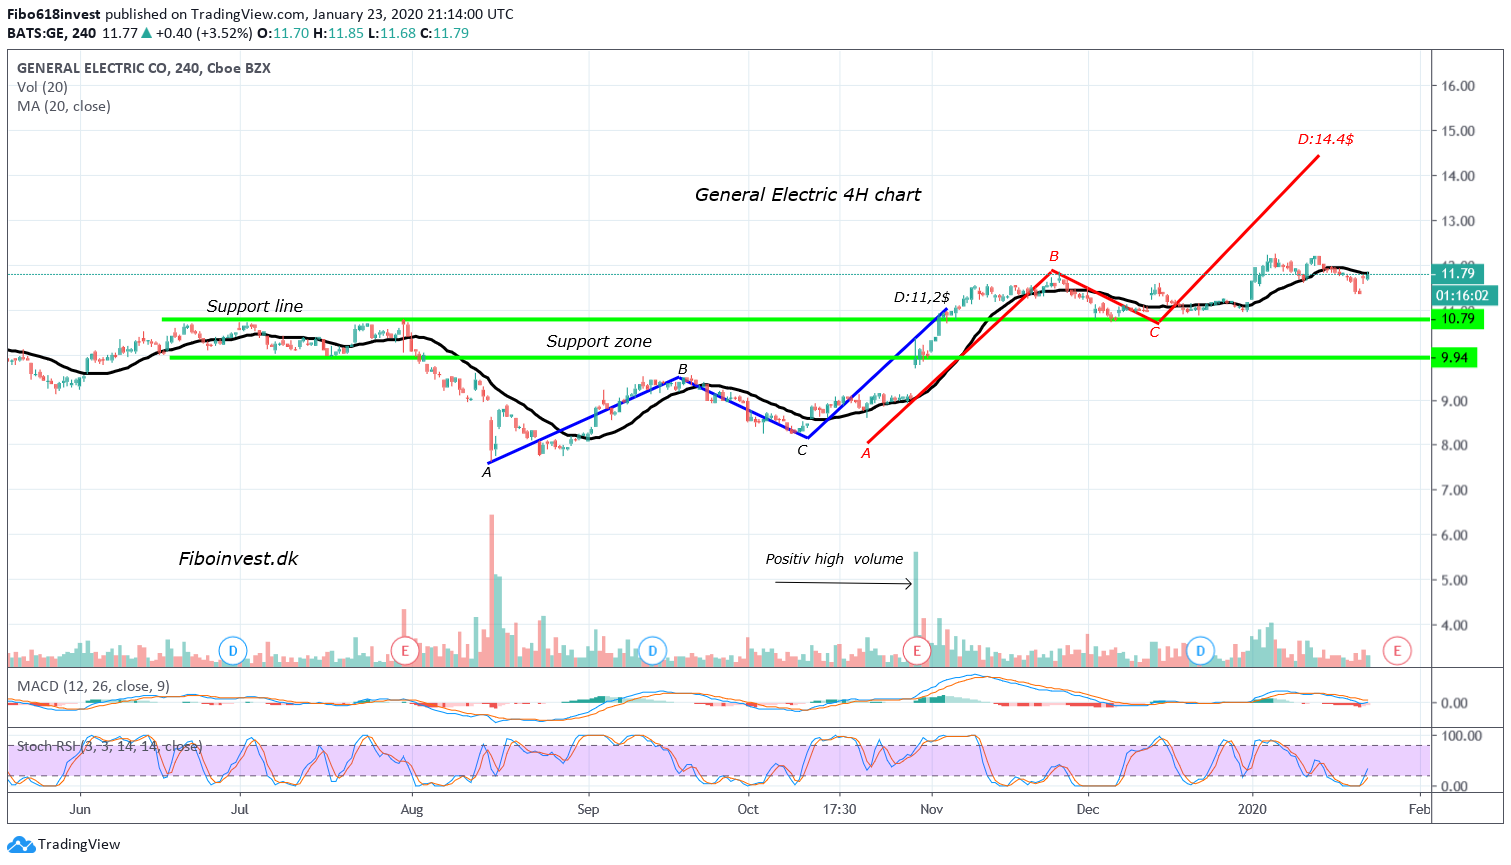 TA af GE 4H chart 23-01-2020